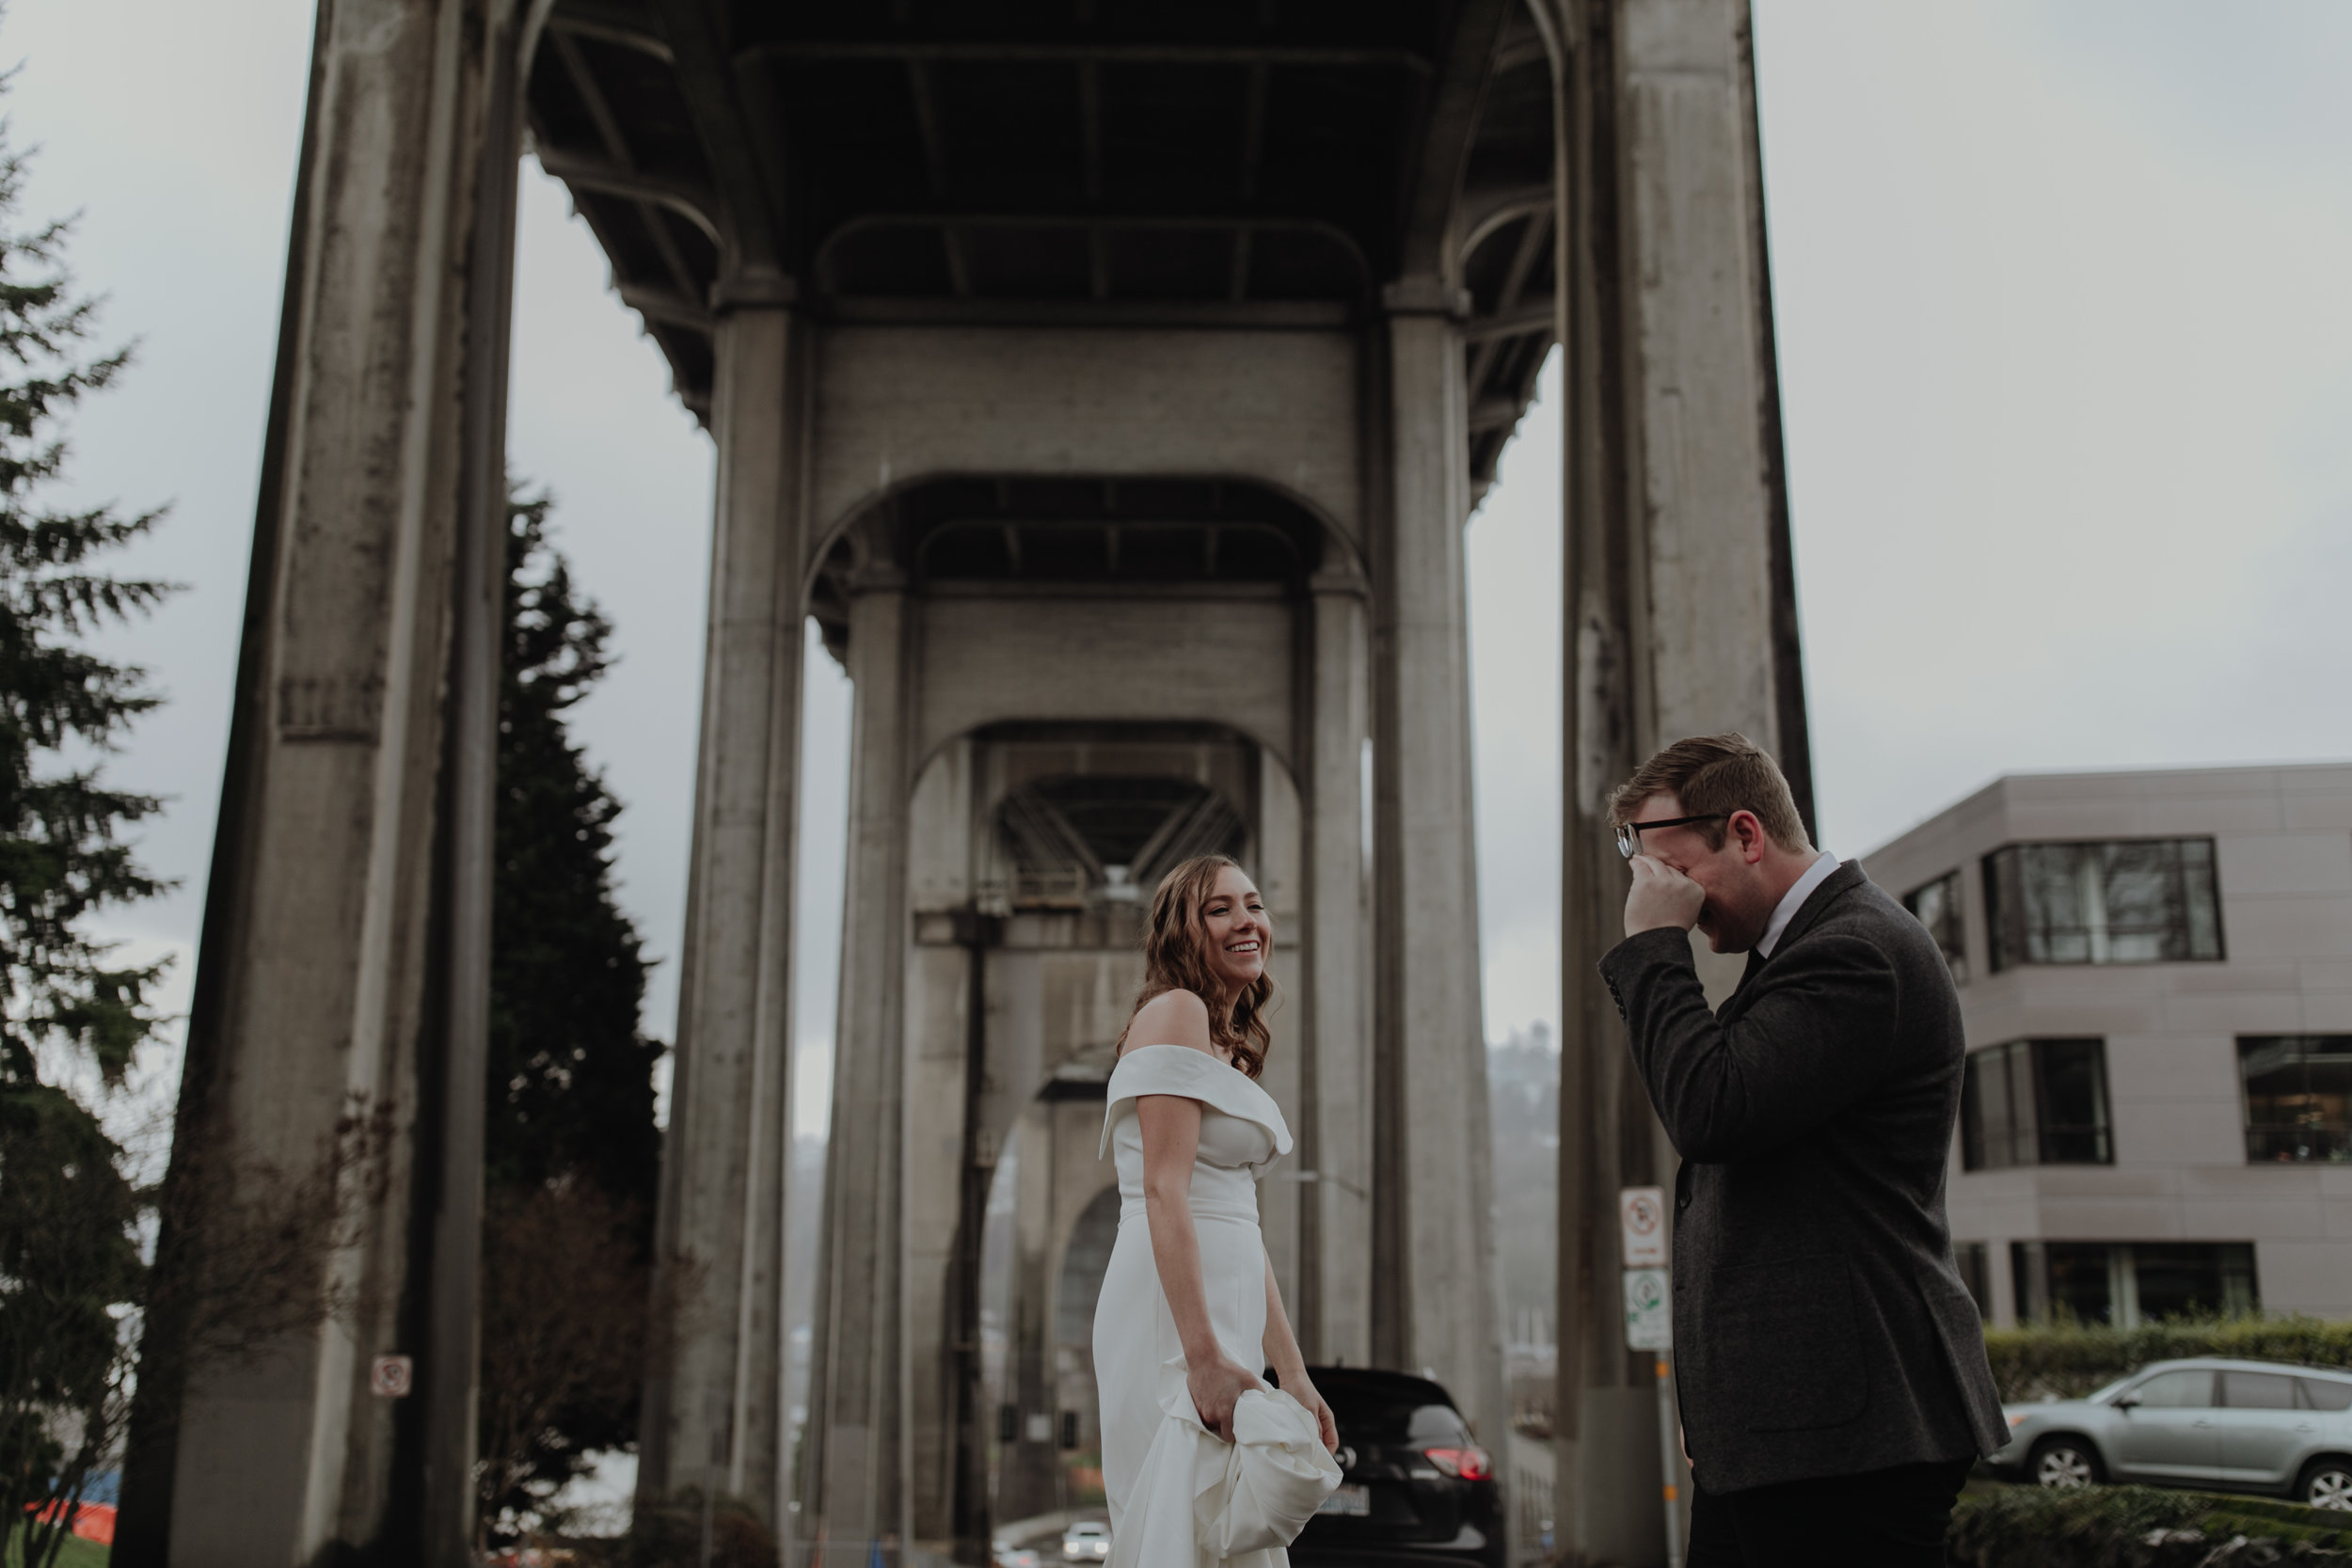 fremontfoundry_seattlewedding_oliviastrohmphotography-9.jpg